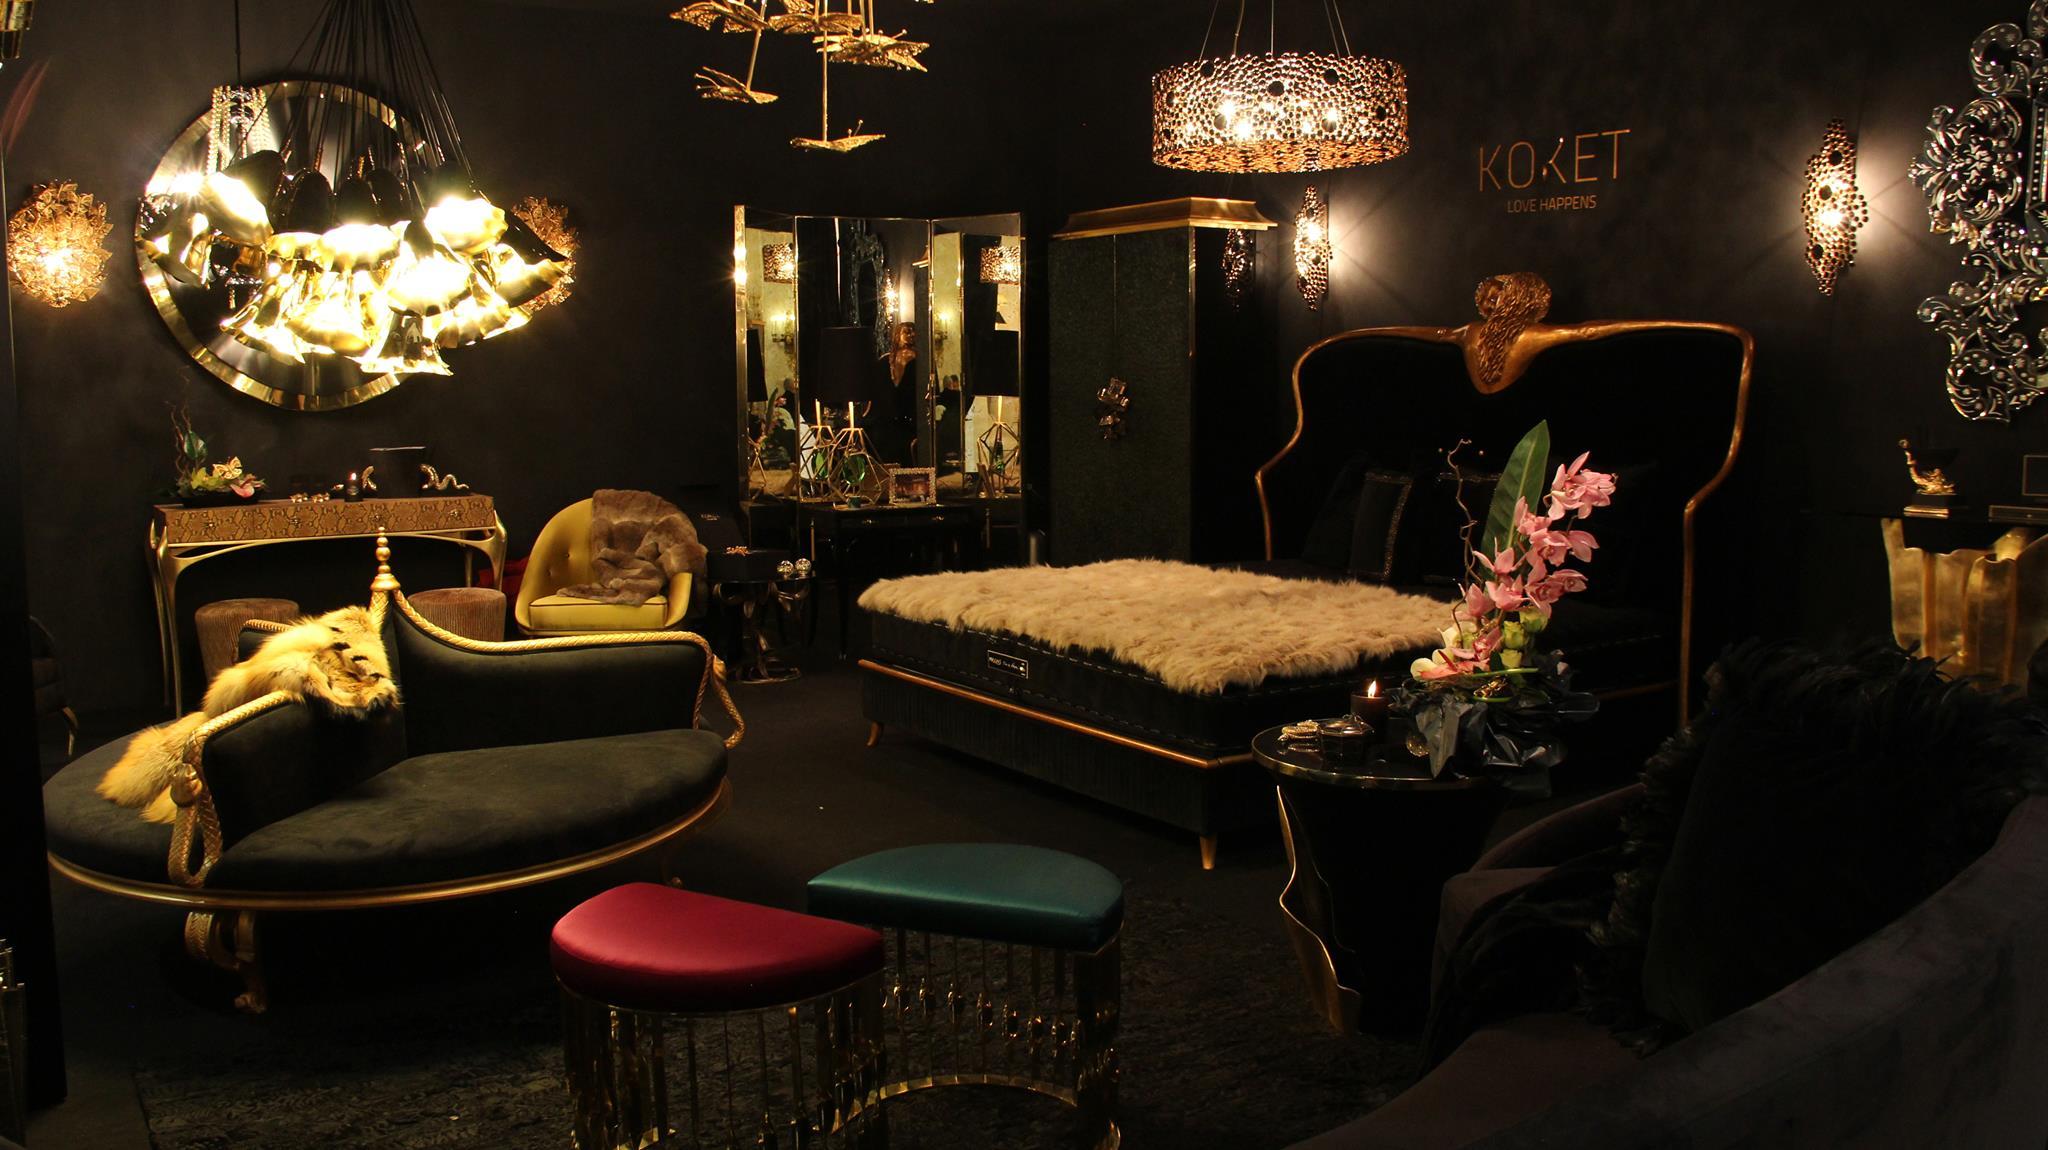 interior design Interview with Janet Morais the Mother of KOKET Interior Design Maison et Objet 2014 Highlights Koket 2